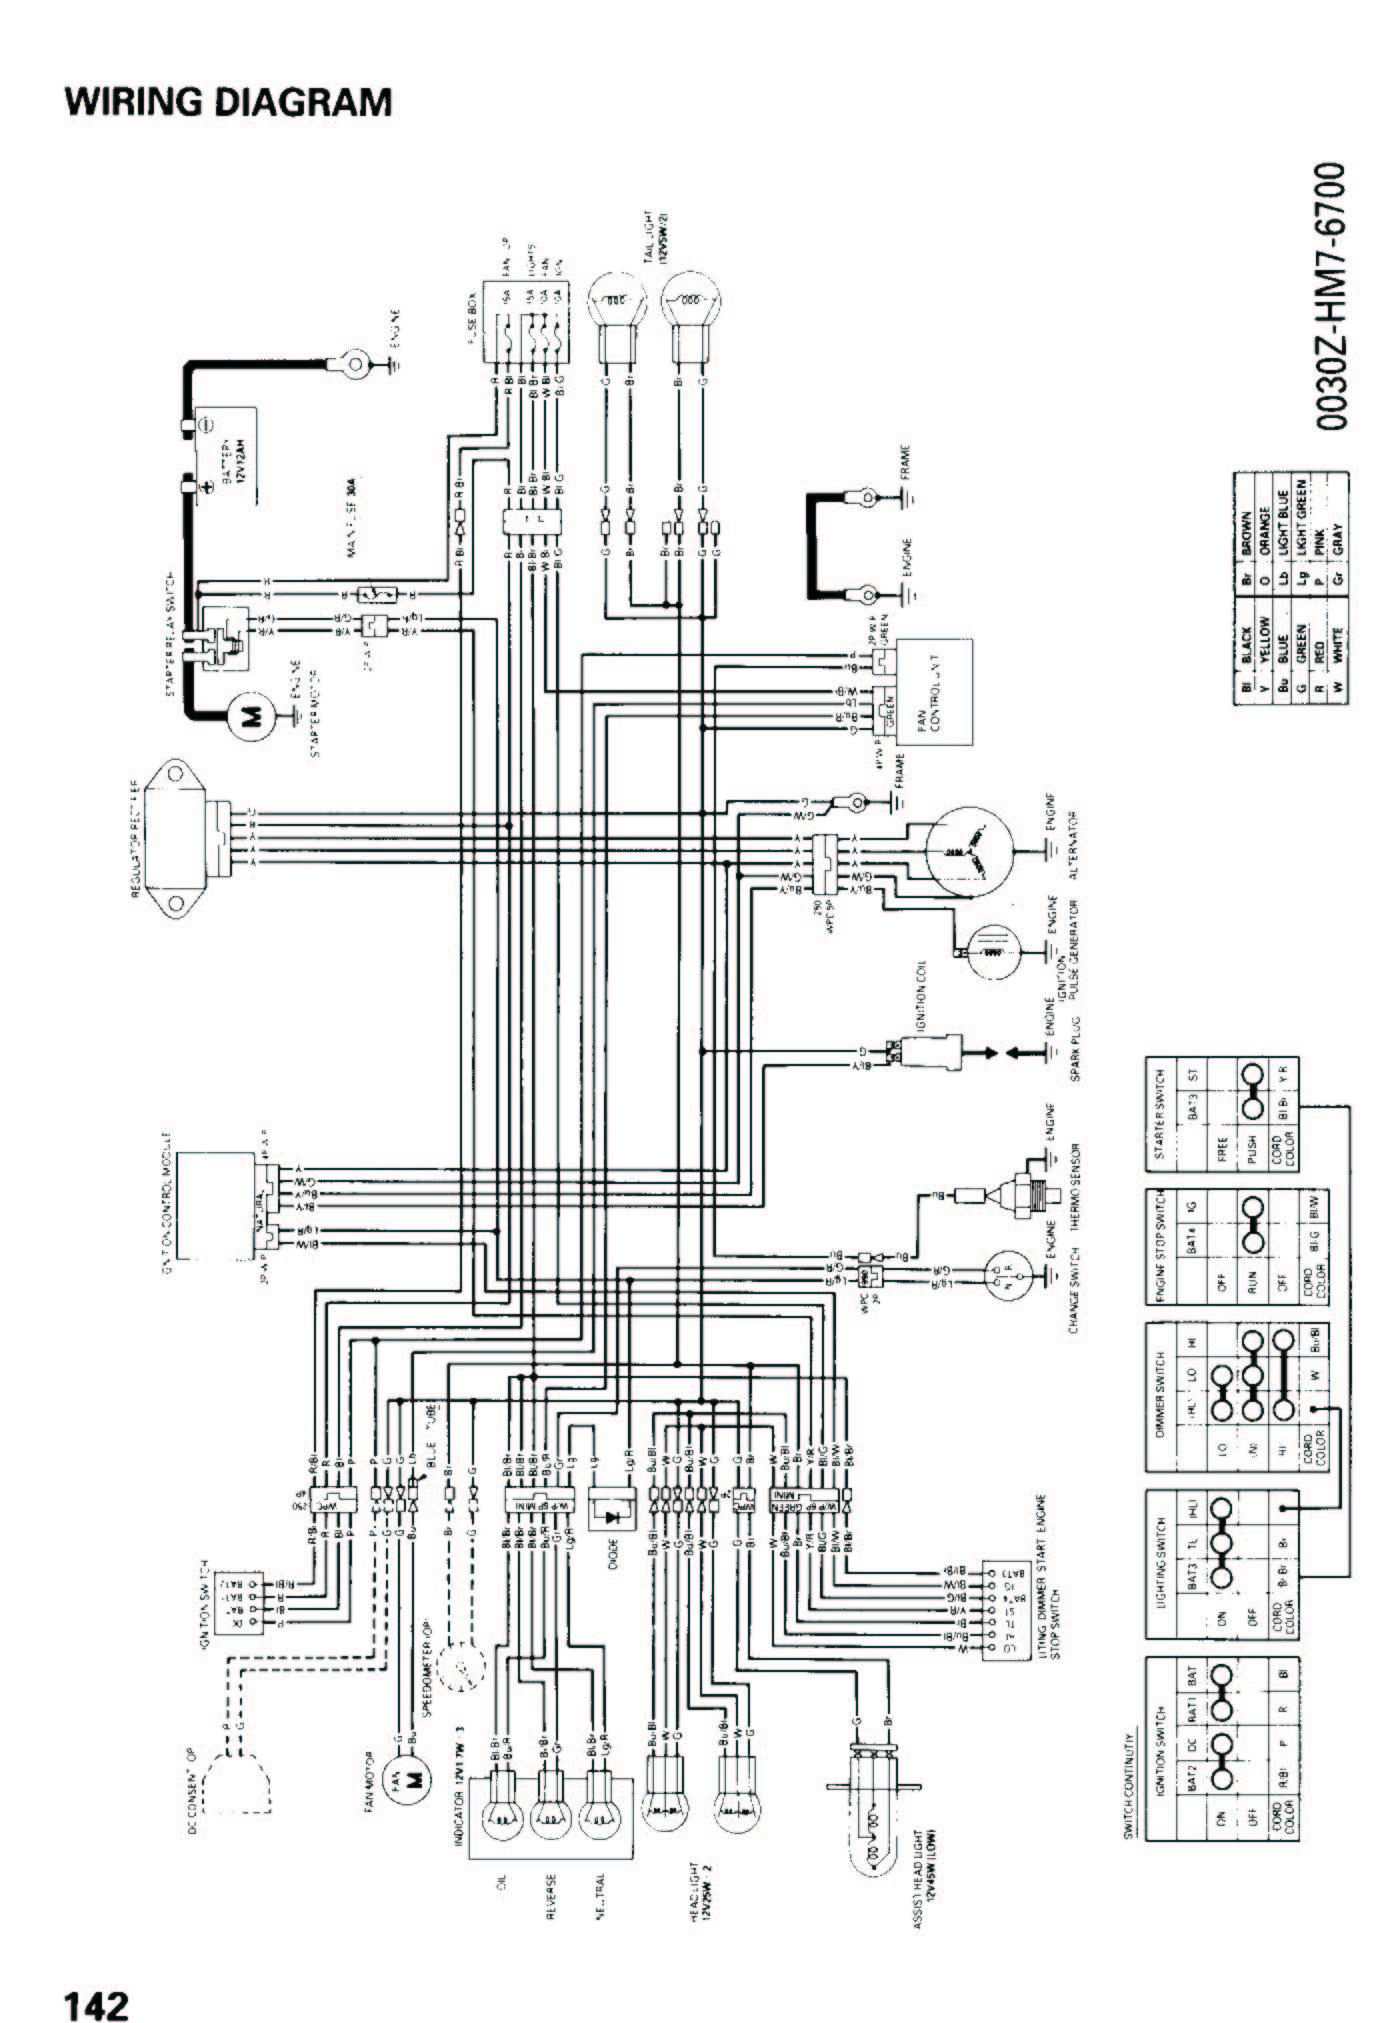 ZL_1553] Honda Trx 400 Foreman Wiring Diagram Wiring DiagramTacle Aeocy Tran Boapu Mohammedshrine Librar Wiring 101